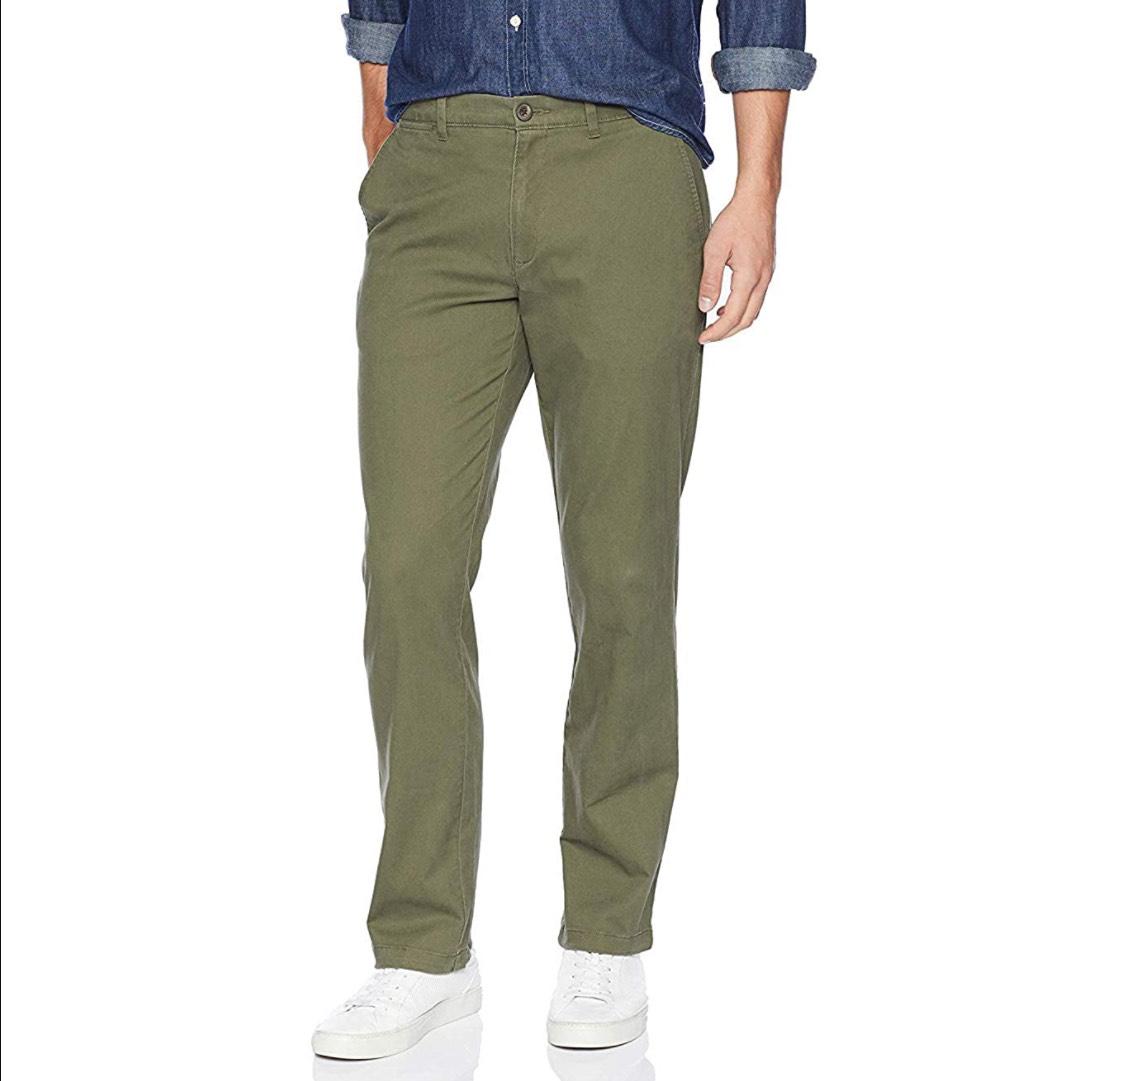 Pantalón tipo chino hombre talla 33W/34L (42)